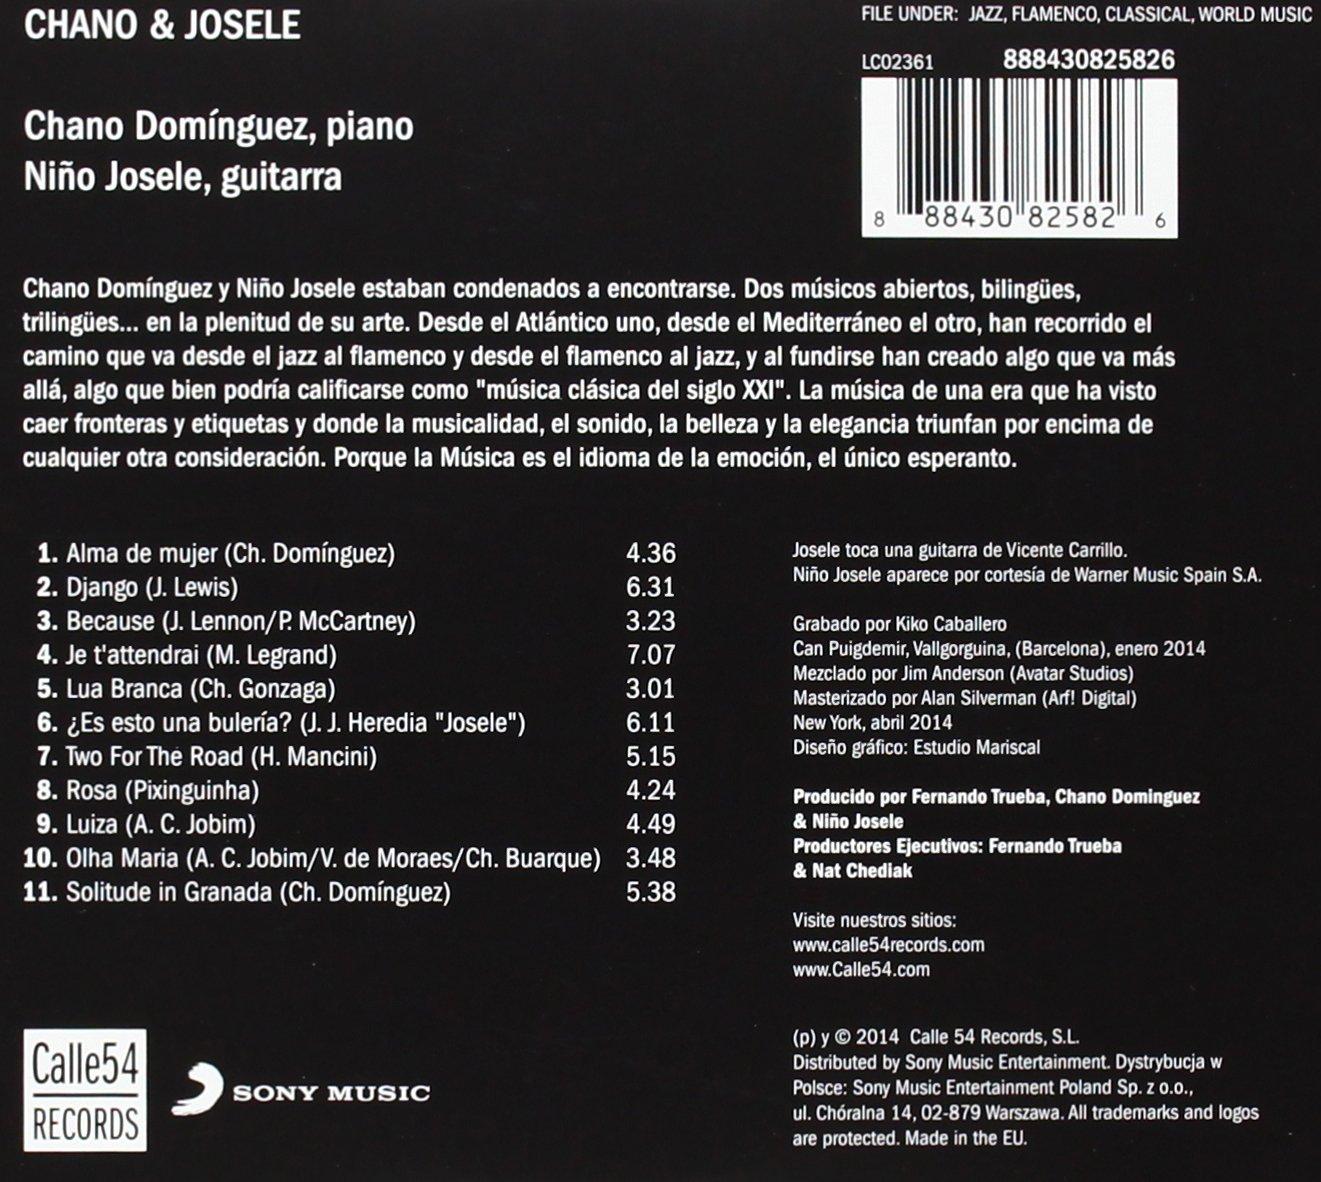 Chano & Josele: Chano & Josele: Amazon.es: Música